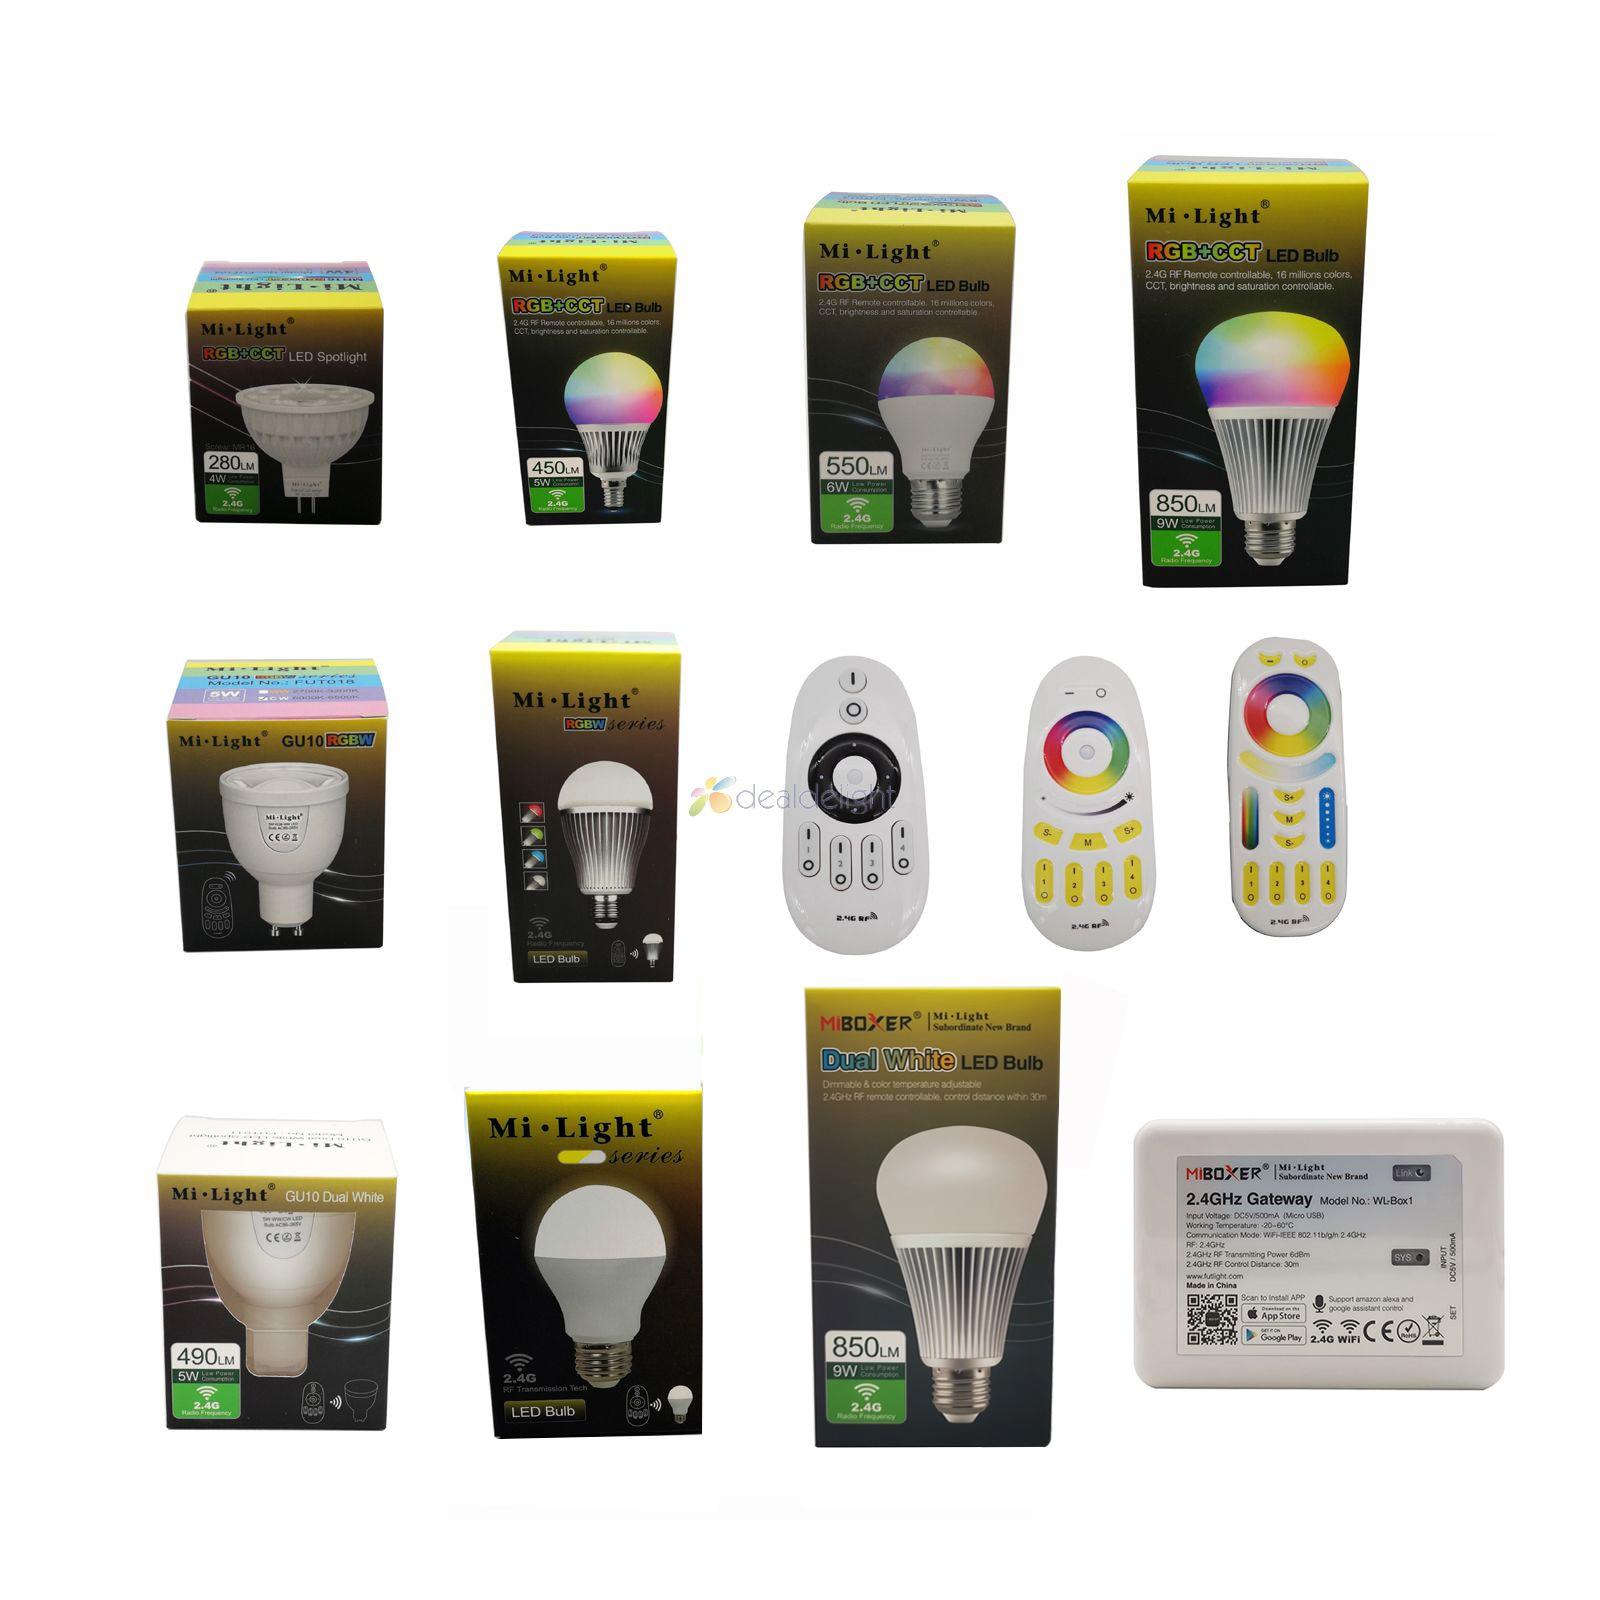 Milight 2.4g lâmpada led mr16 gu10 e14 e27 lâmpada led 4 w 5 6 9 12 cct rgbw rgbww rgb + cct led luz sem fio wi-fi controle remoto